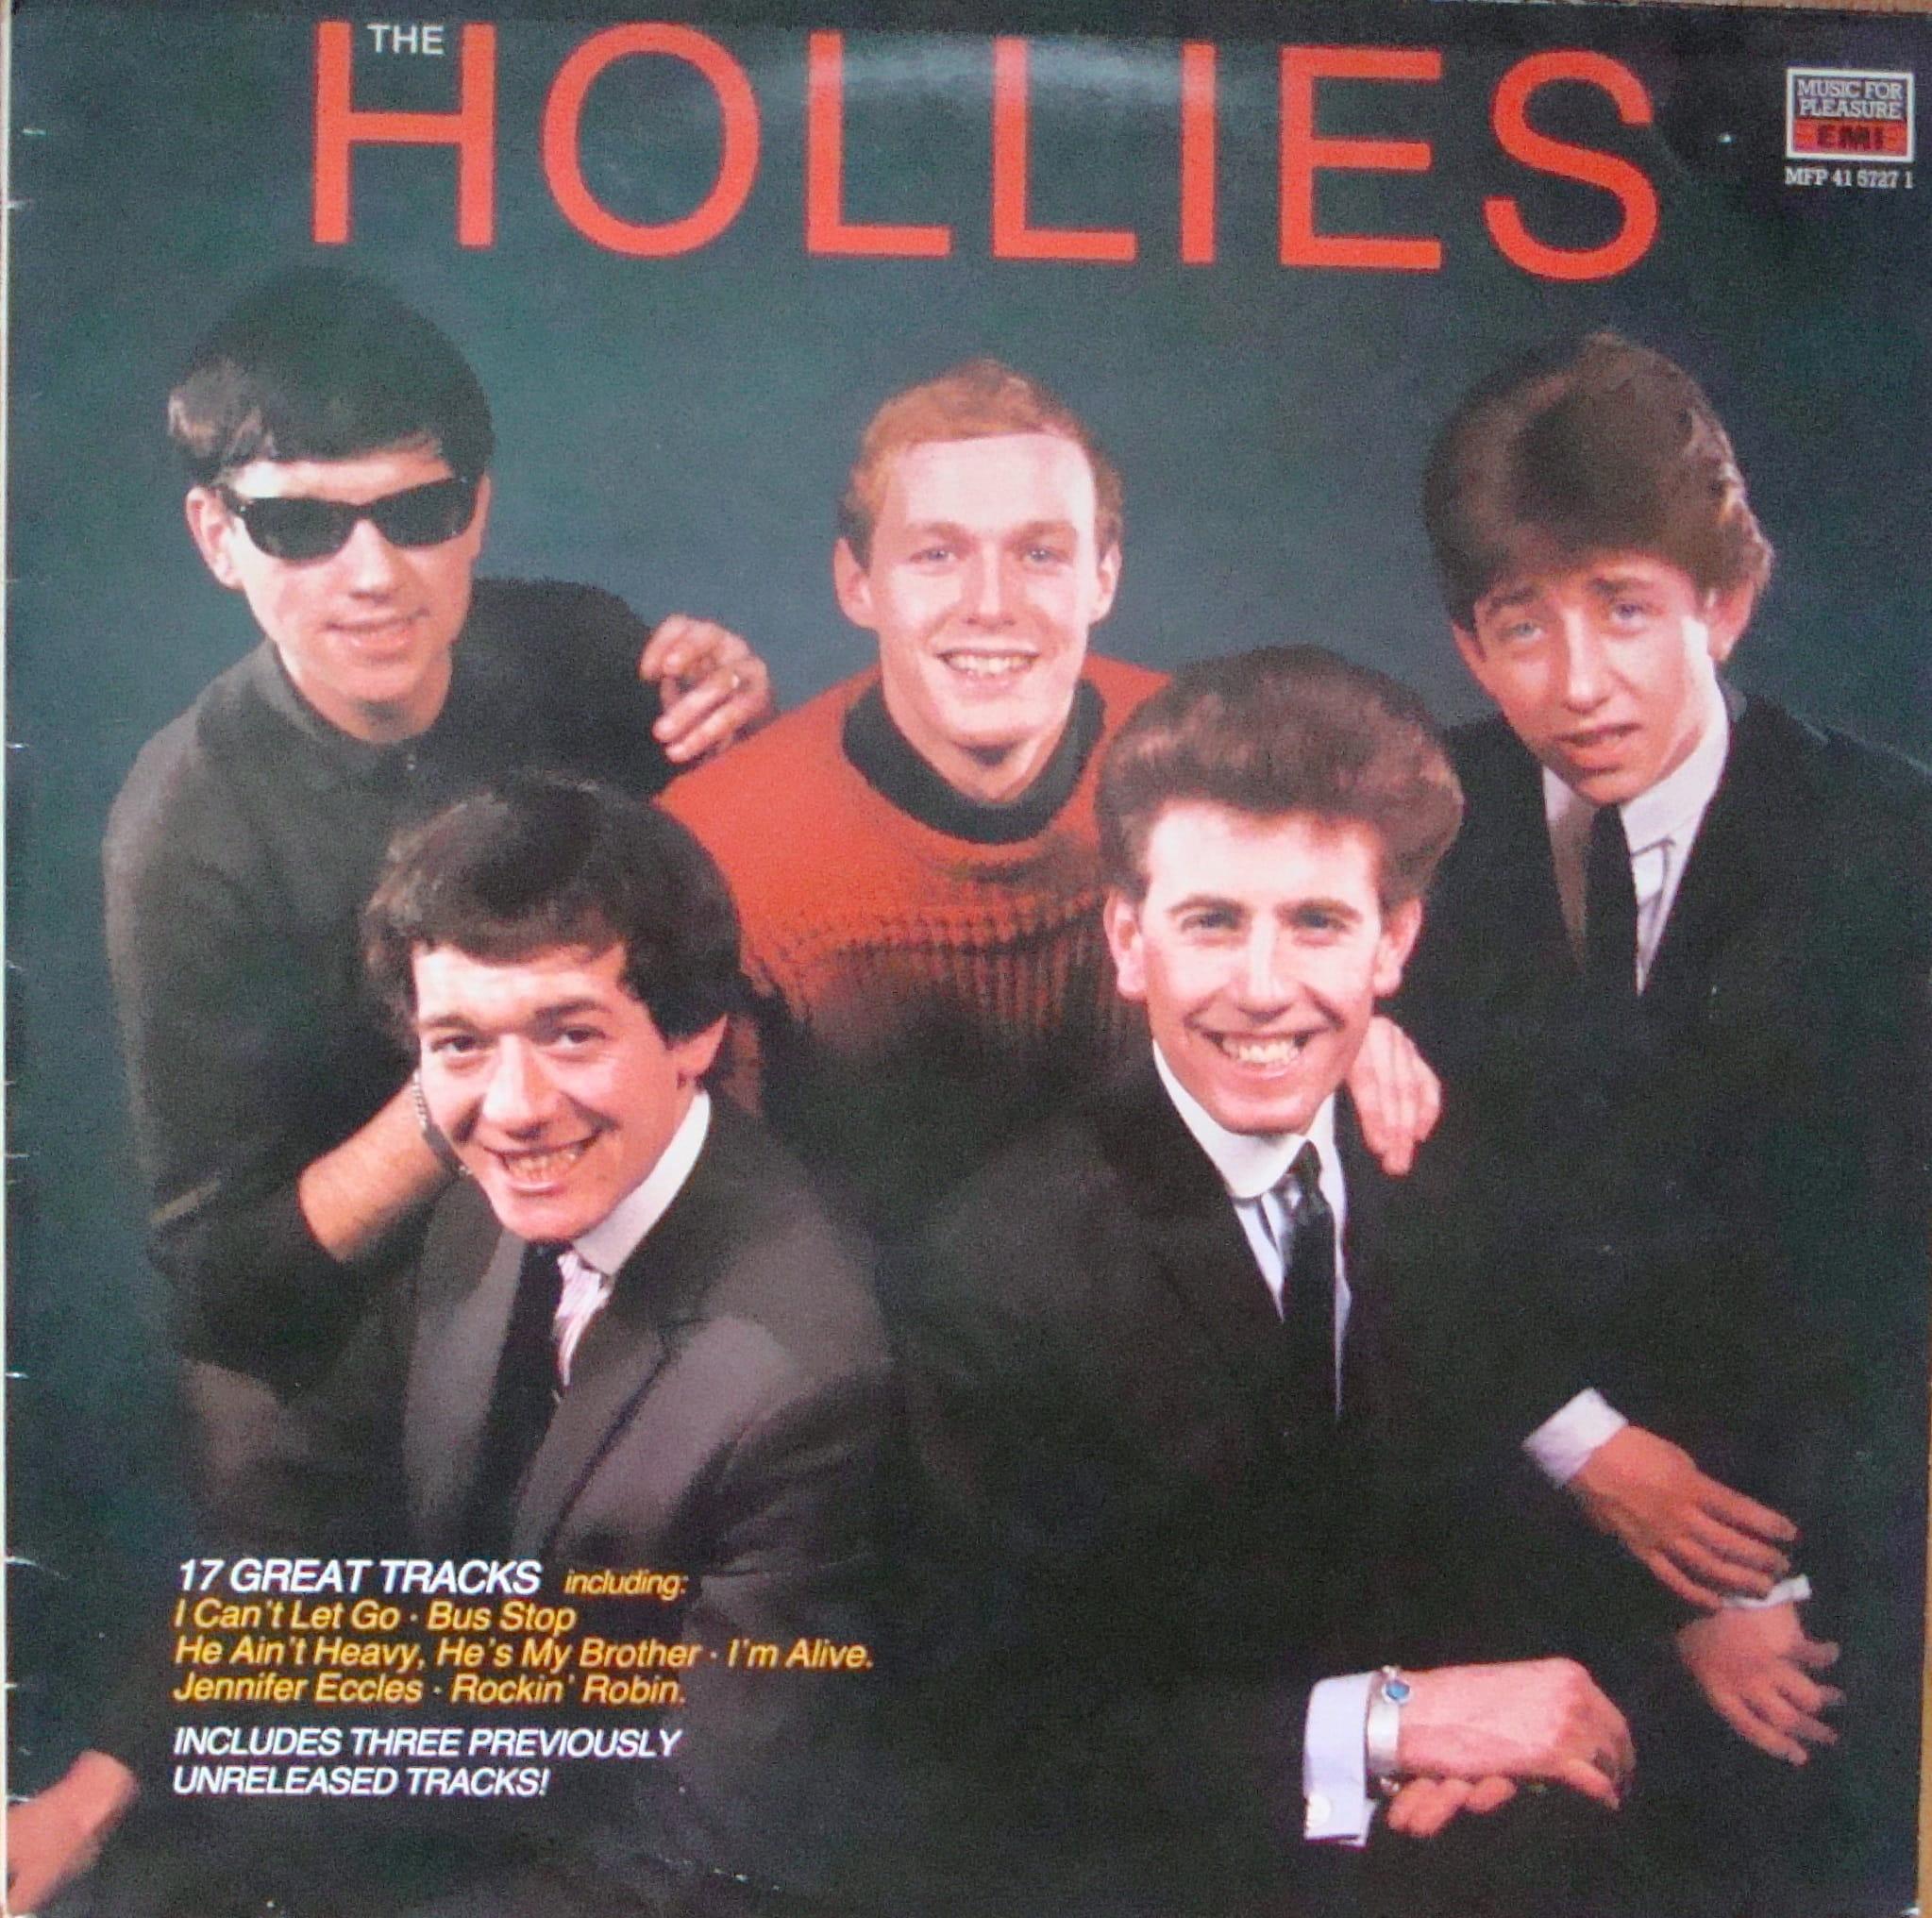 The Hollies The Hollies Mfp 41 5727 1 Vinyl